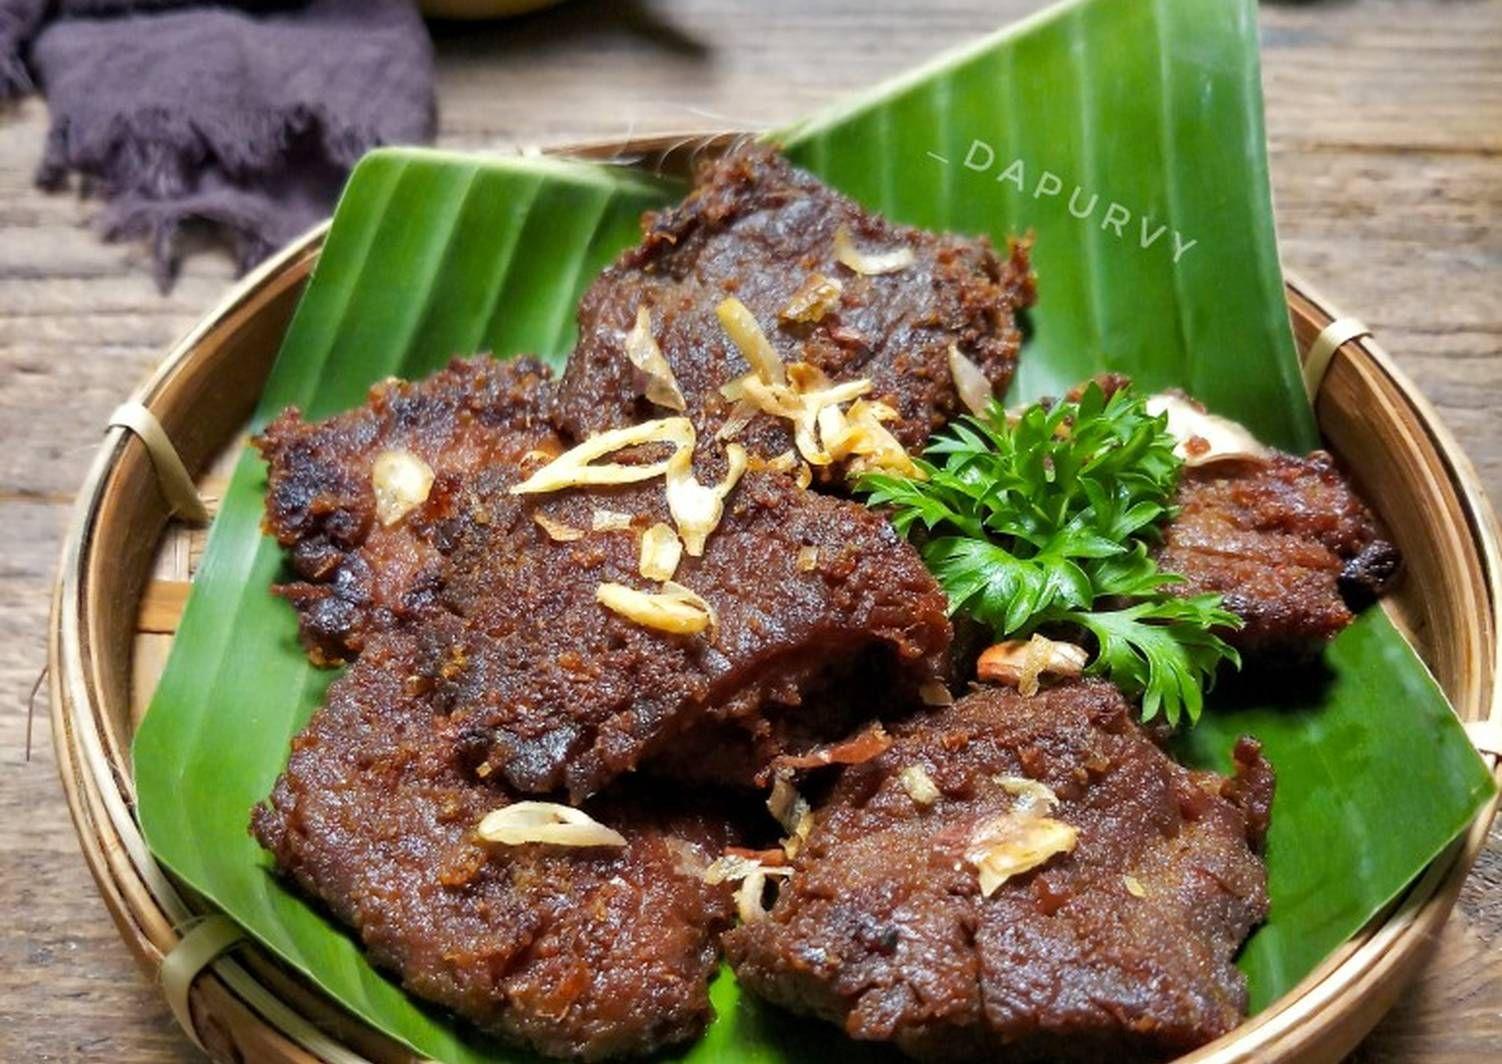 Resep Empal Gepuk Daging Sapi Oleh Dapurvy Resep Resep Masakan Resep Masakan